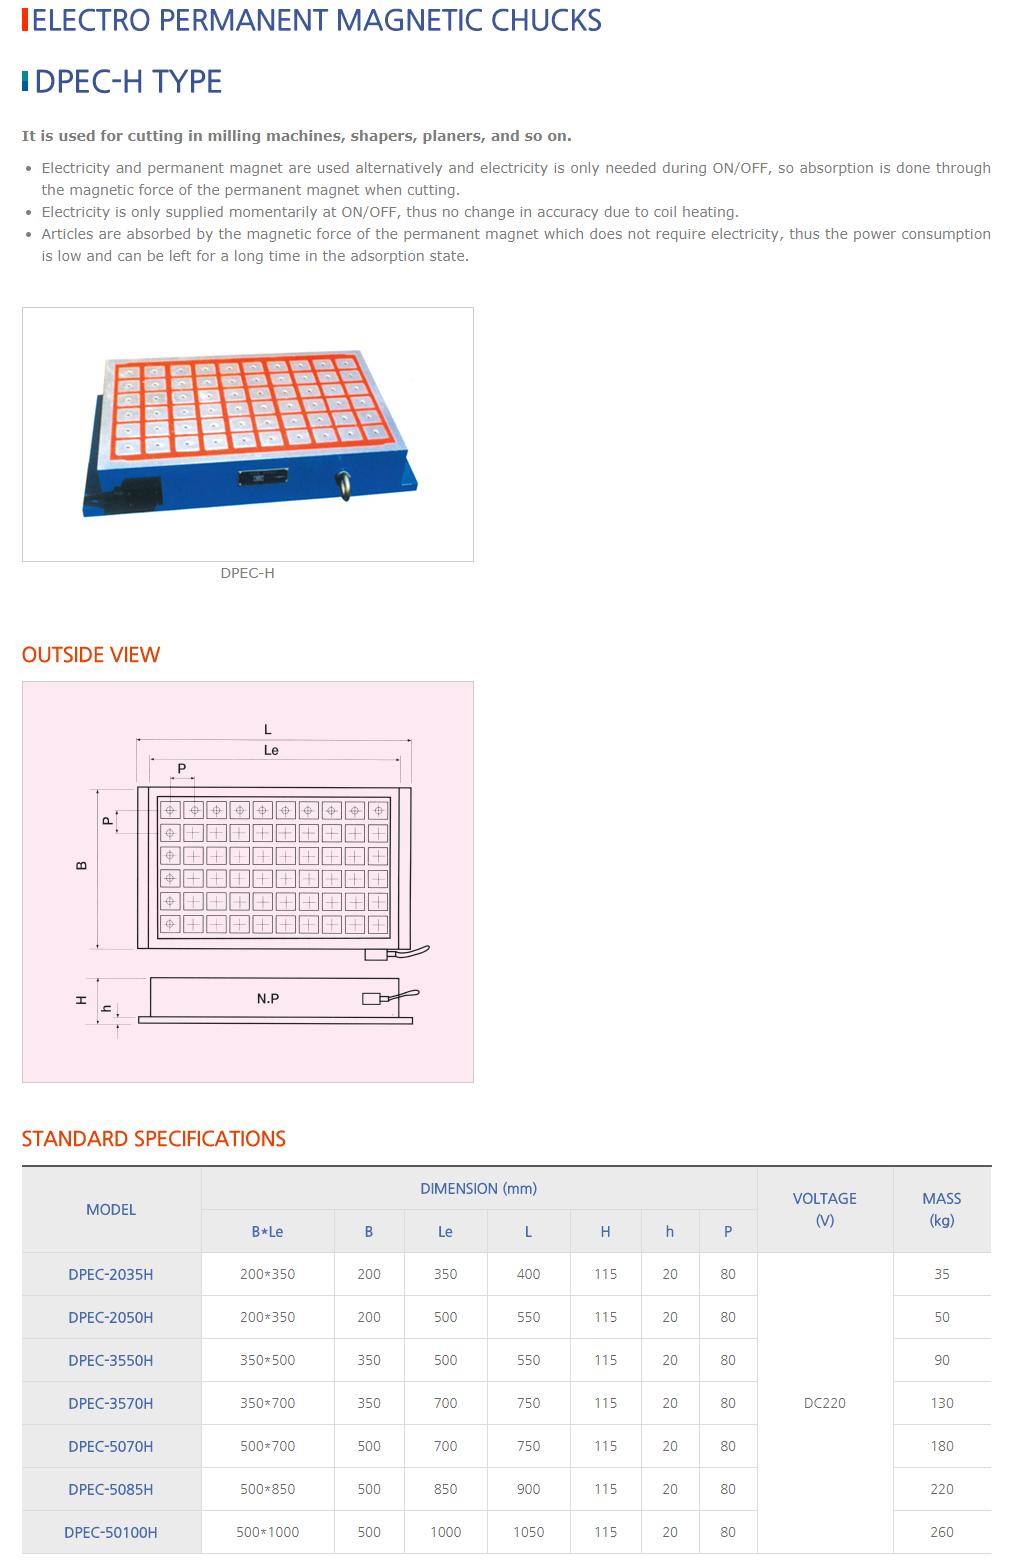 DAESUNG MARGNET Electro Permanent Magnetic Chucks DPEC-H Type